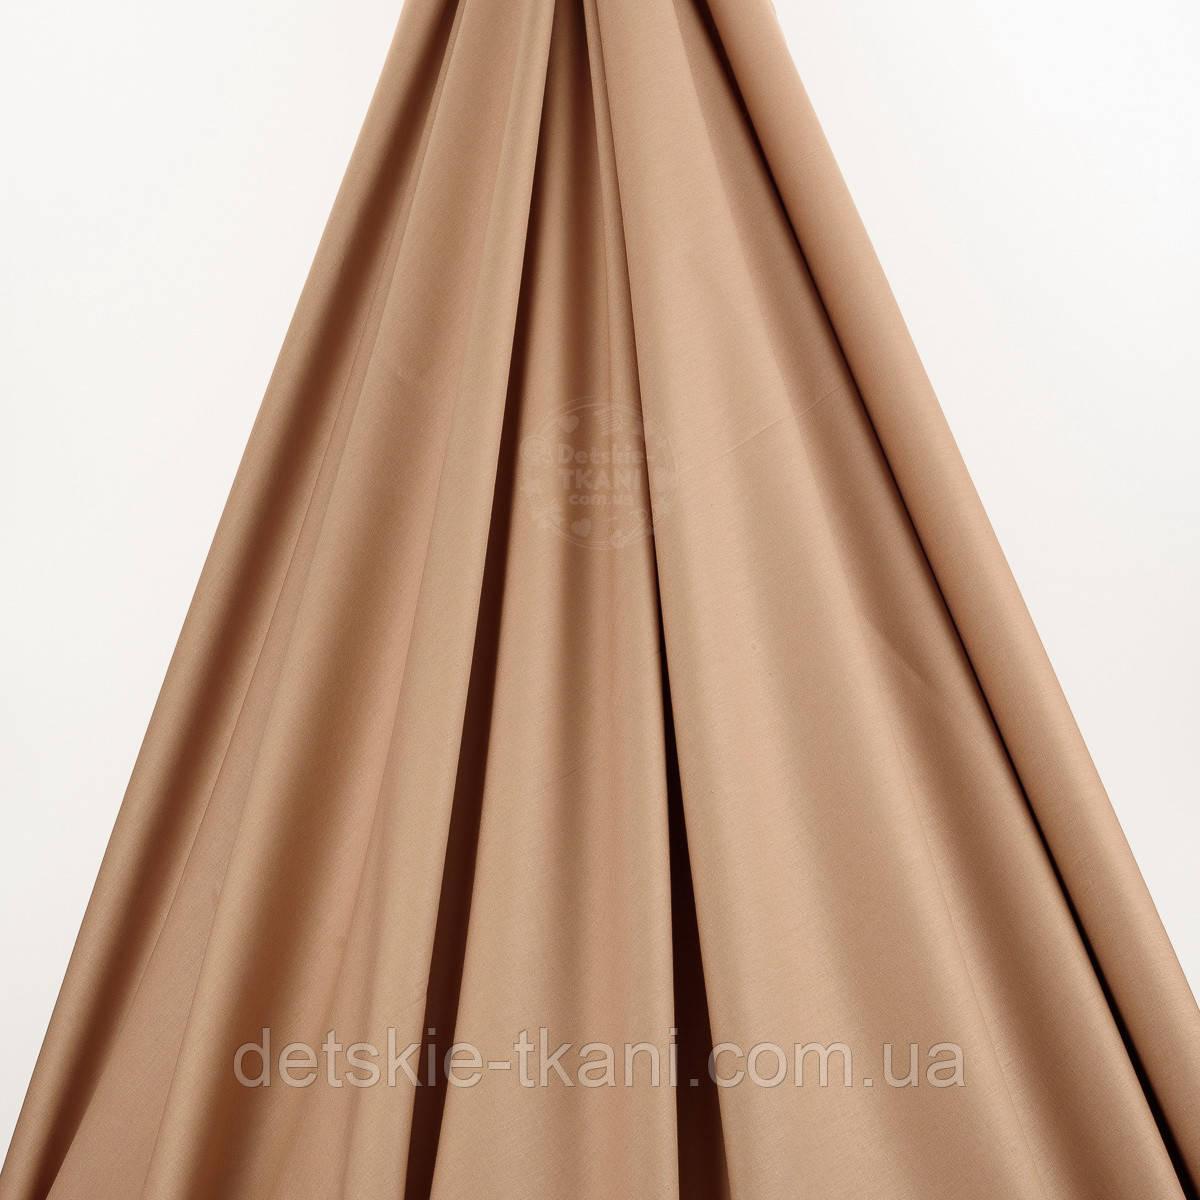 Лоскут поплина, цвет мокко №67-1358, размер 42*120 см